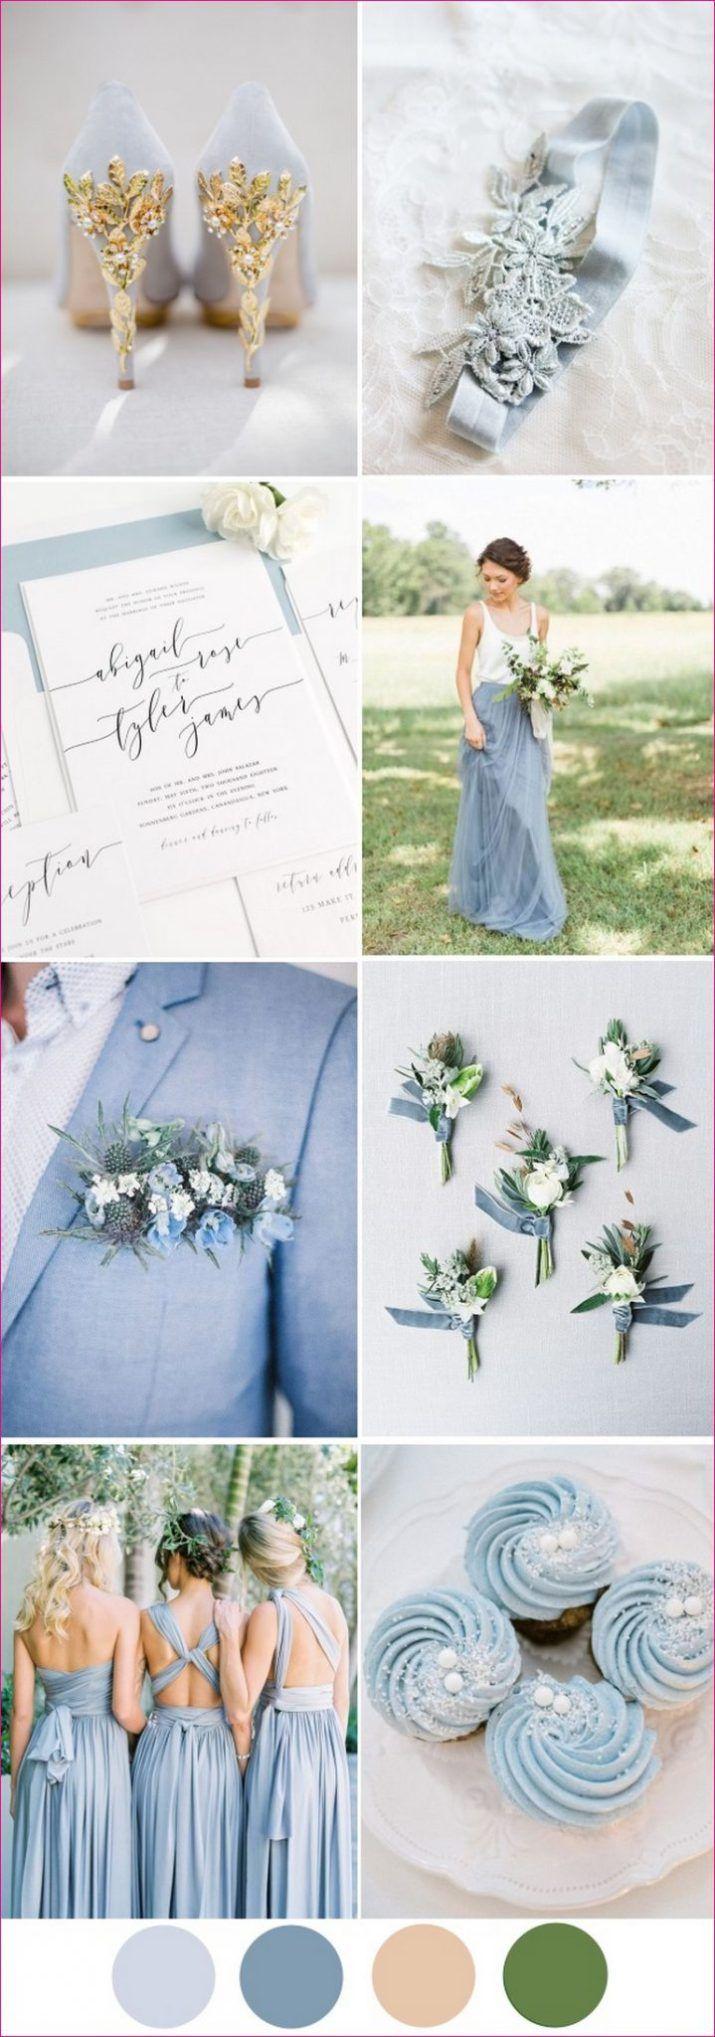 Wedding color palettes for spring summer 2017 127 | Weddings ...